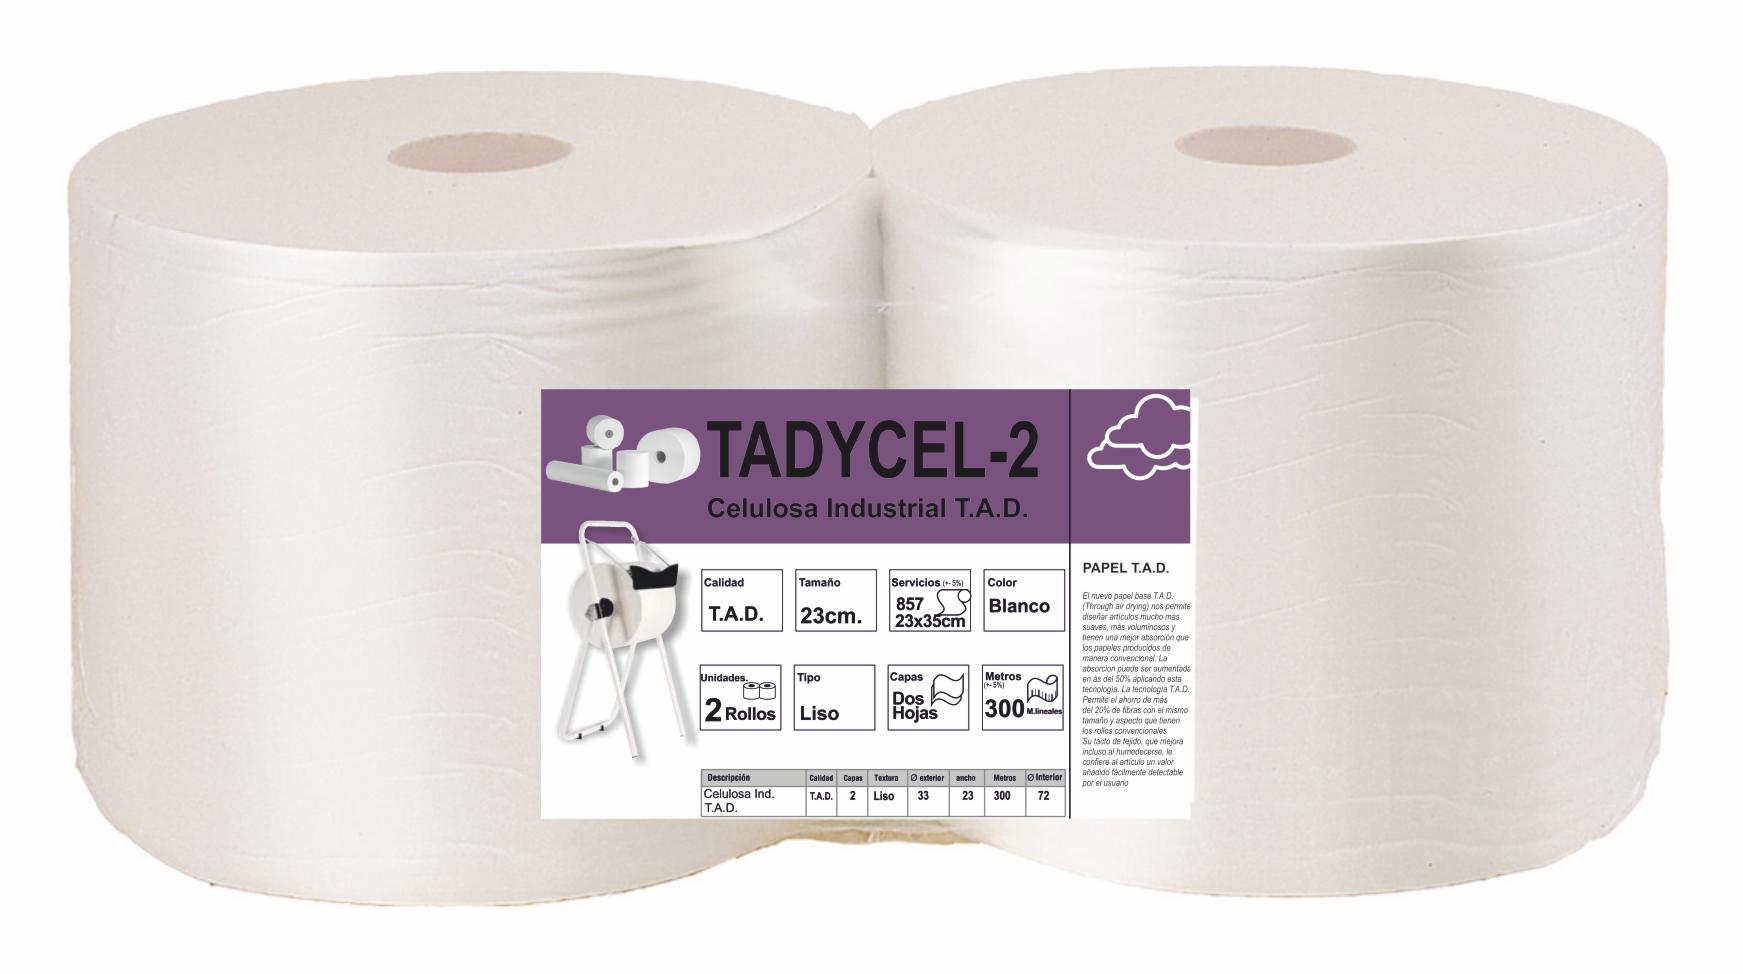 Tadycel-2